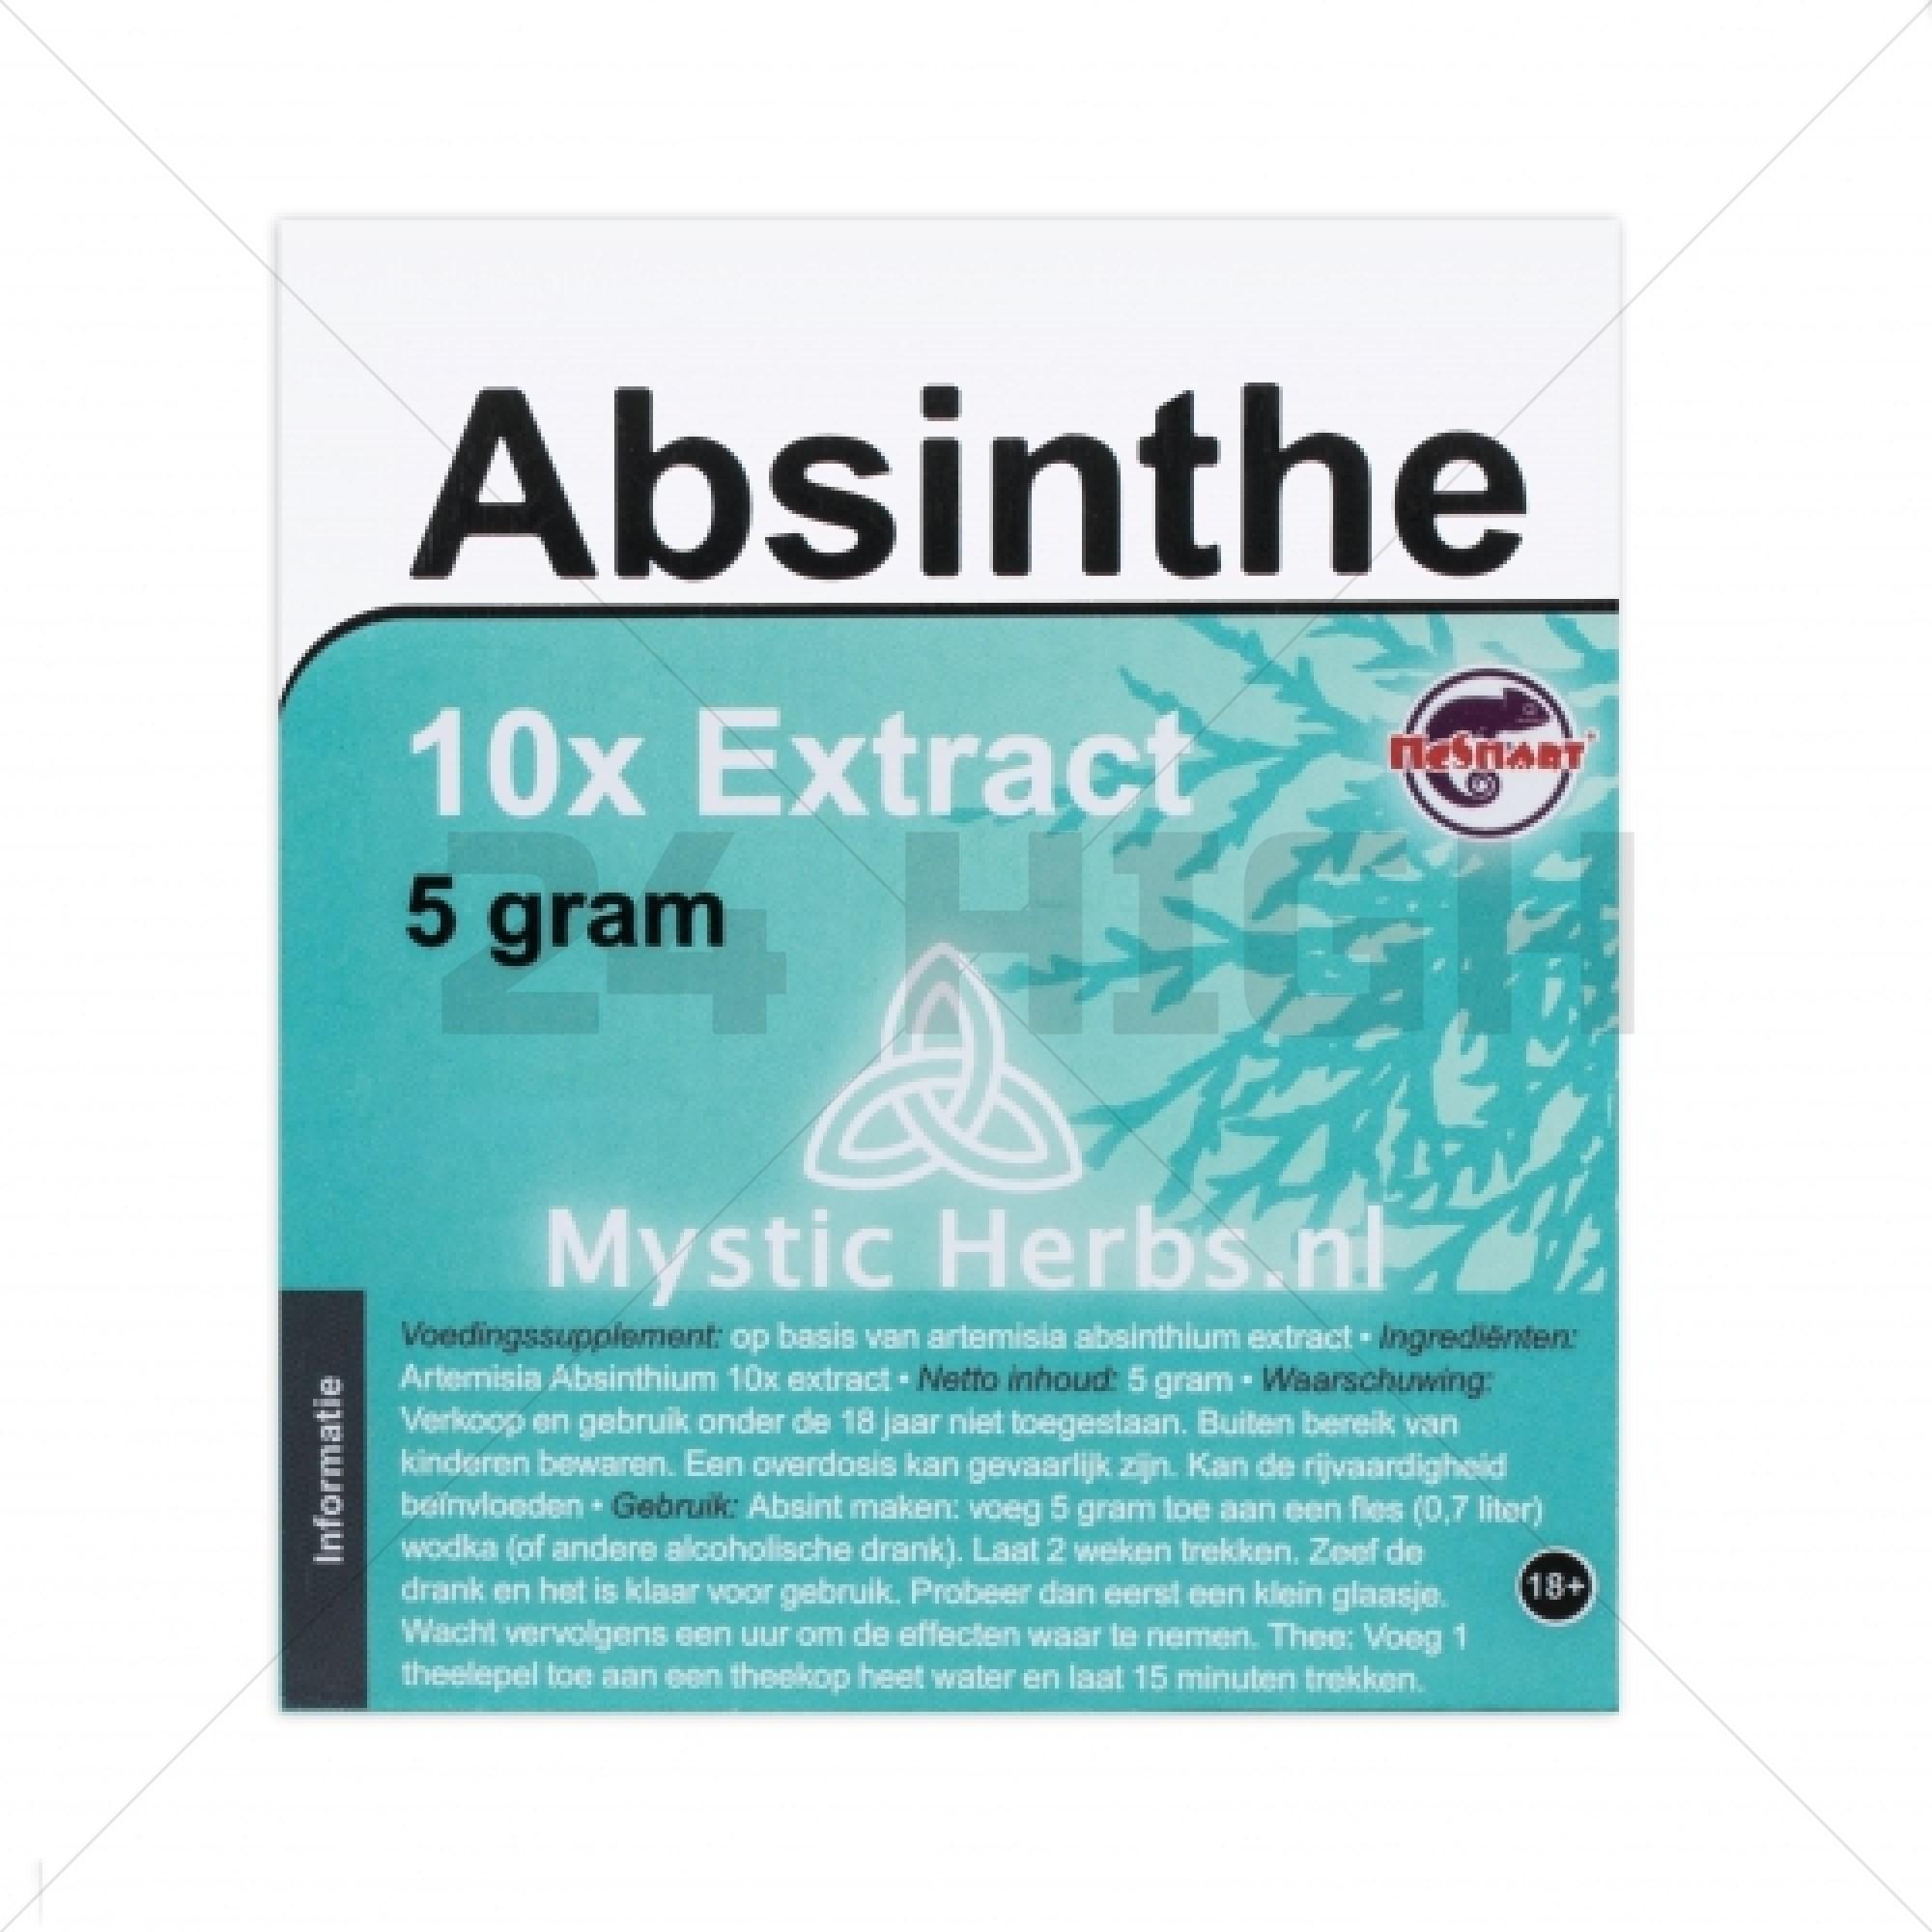 Absinthe  - 10X Extract